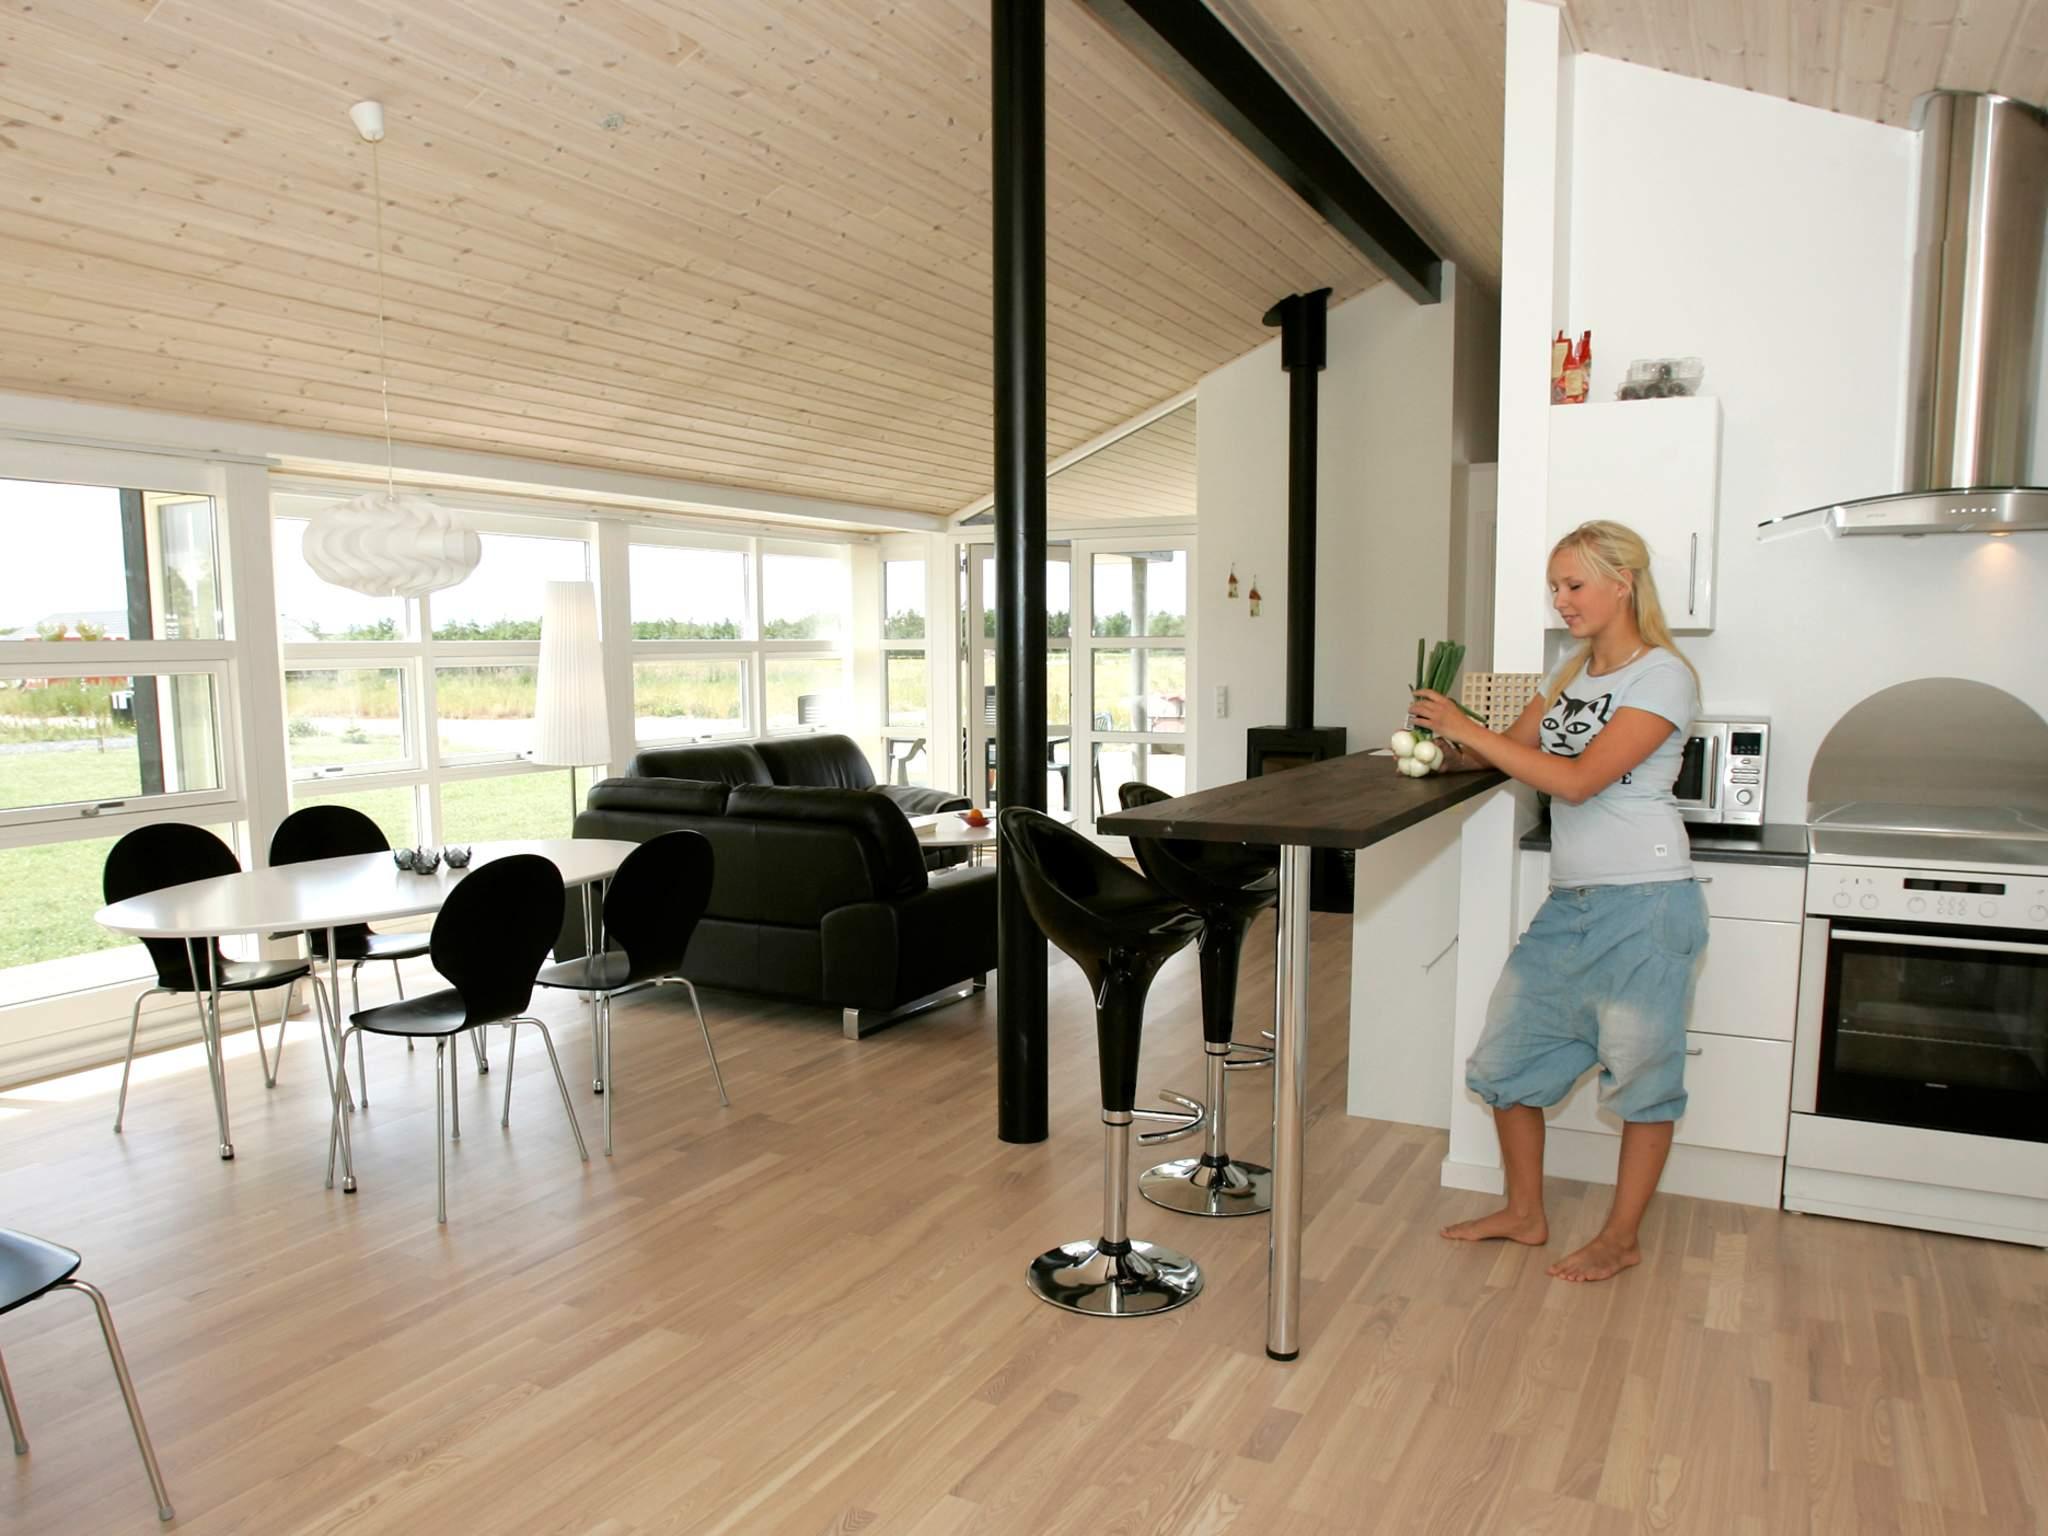 Ferienhaus Øster Hurup (301886), Øster Hurup, , Ostjütland, Dänemark, Bild 5